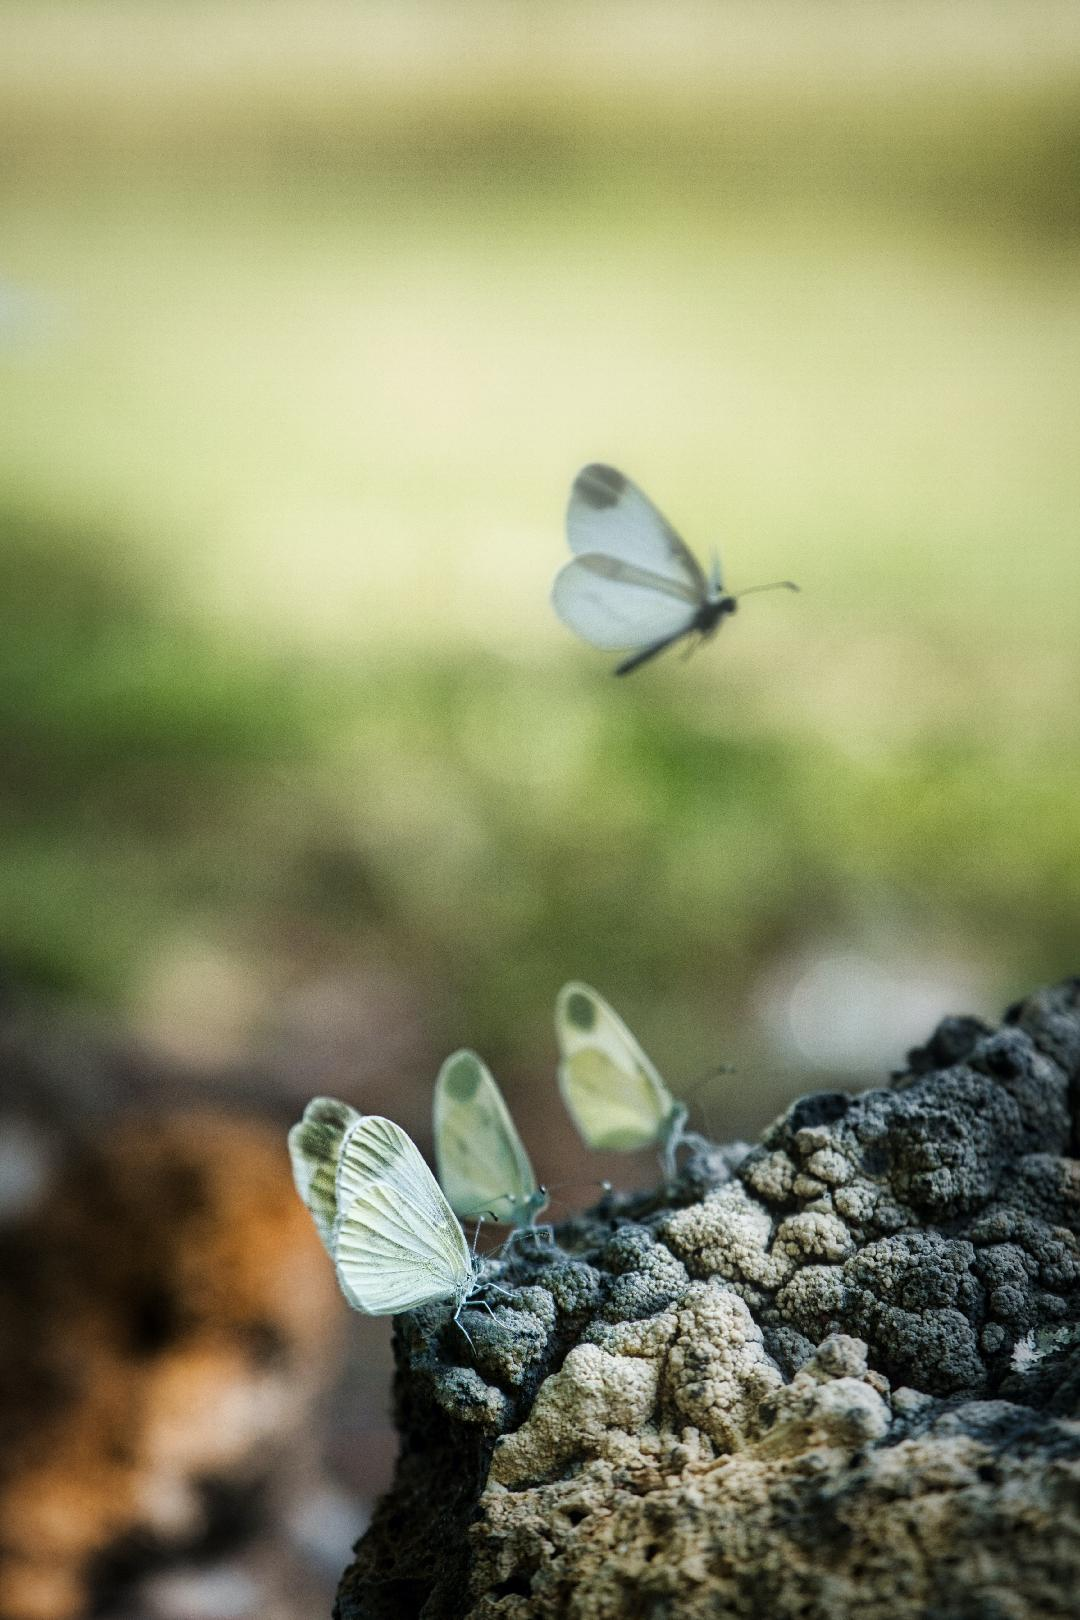 viewfinder-negatieve-ruimte-fotografie-natuurfotografie-vlinders-tinkerbell-peter-pan.jpg